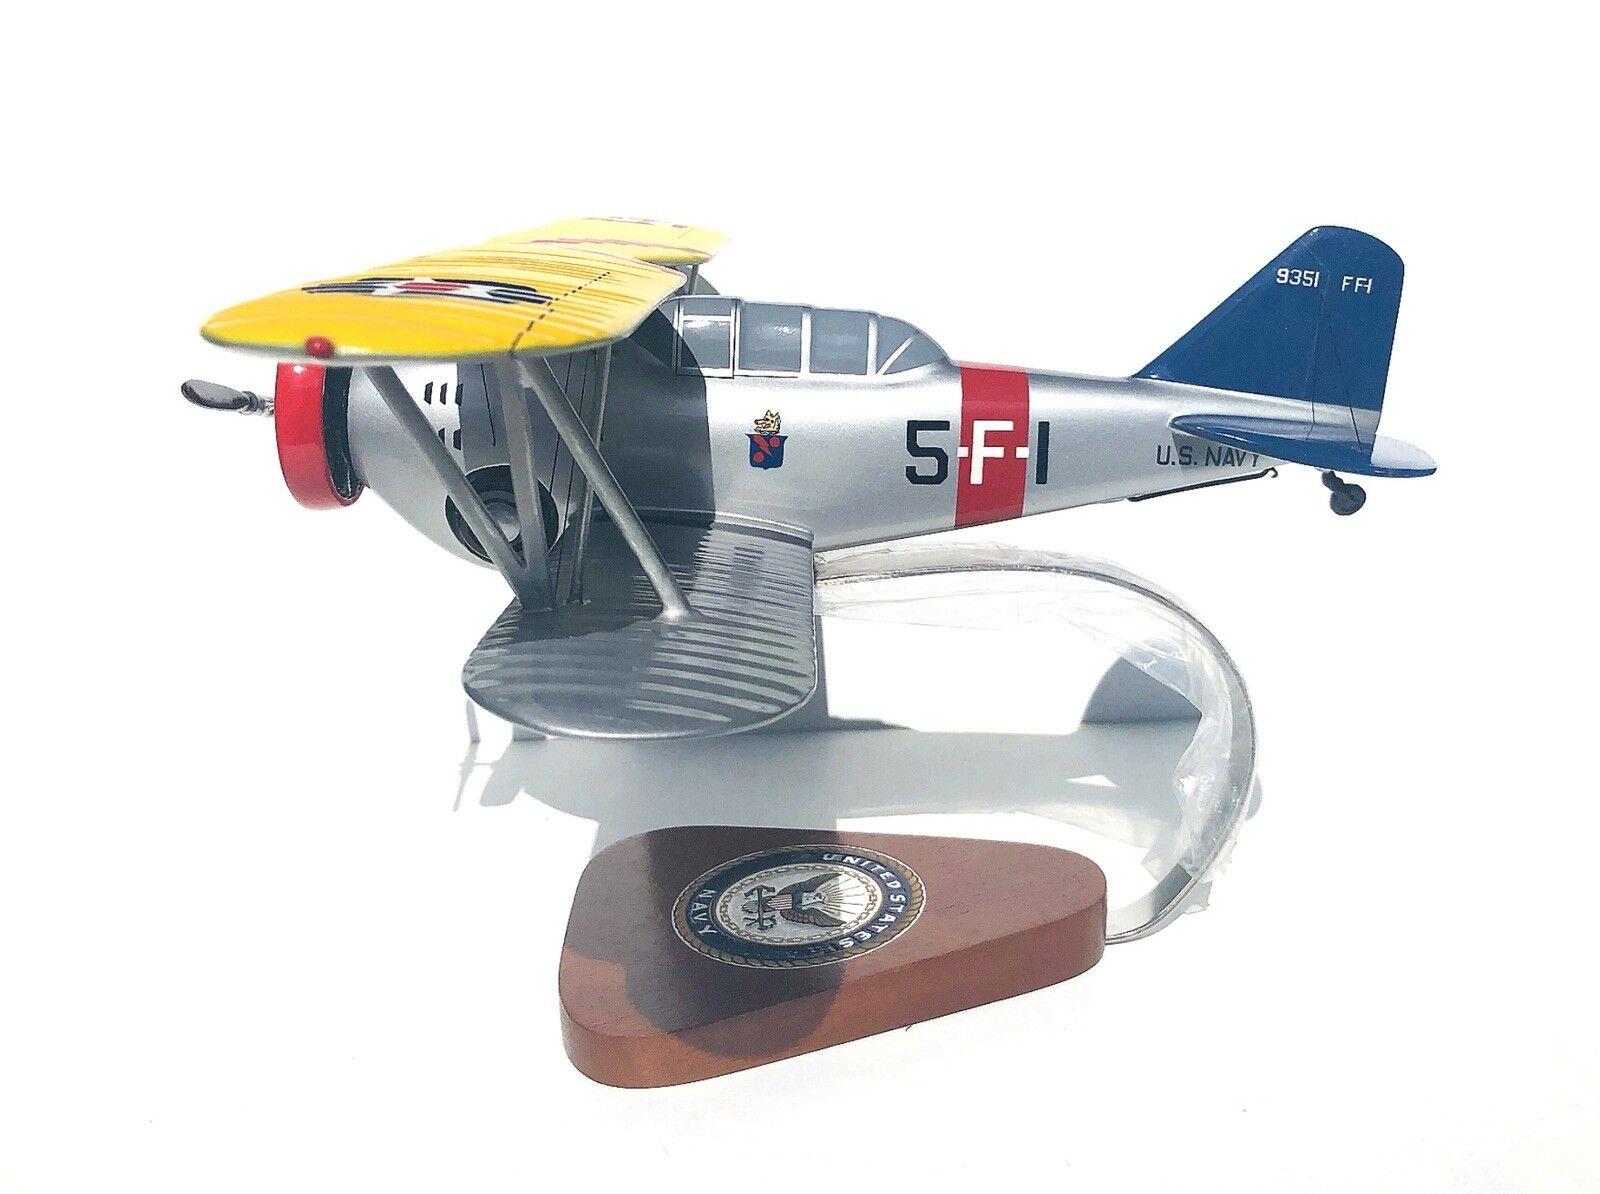 PACIFIC AIRCRAFT US NAVY GRUMMAN FIFI FF-1 WOOD MODEL AIRPLANE